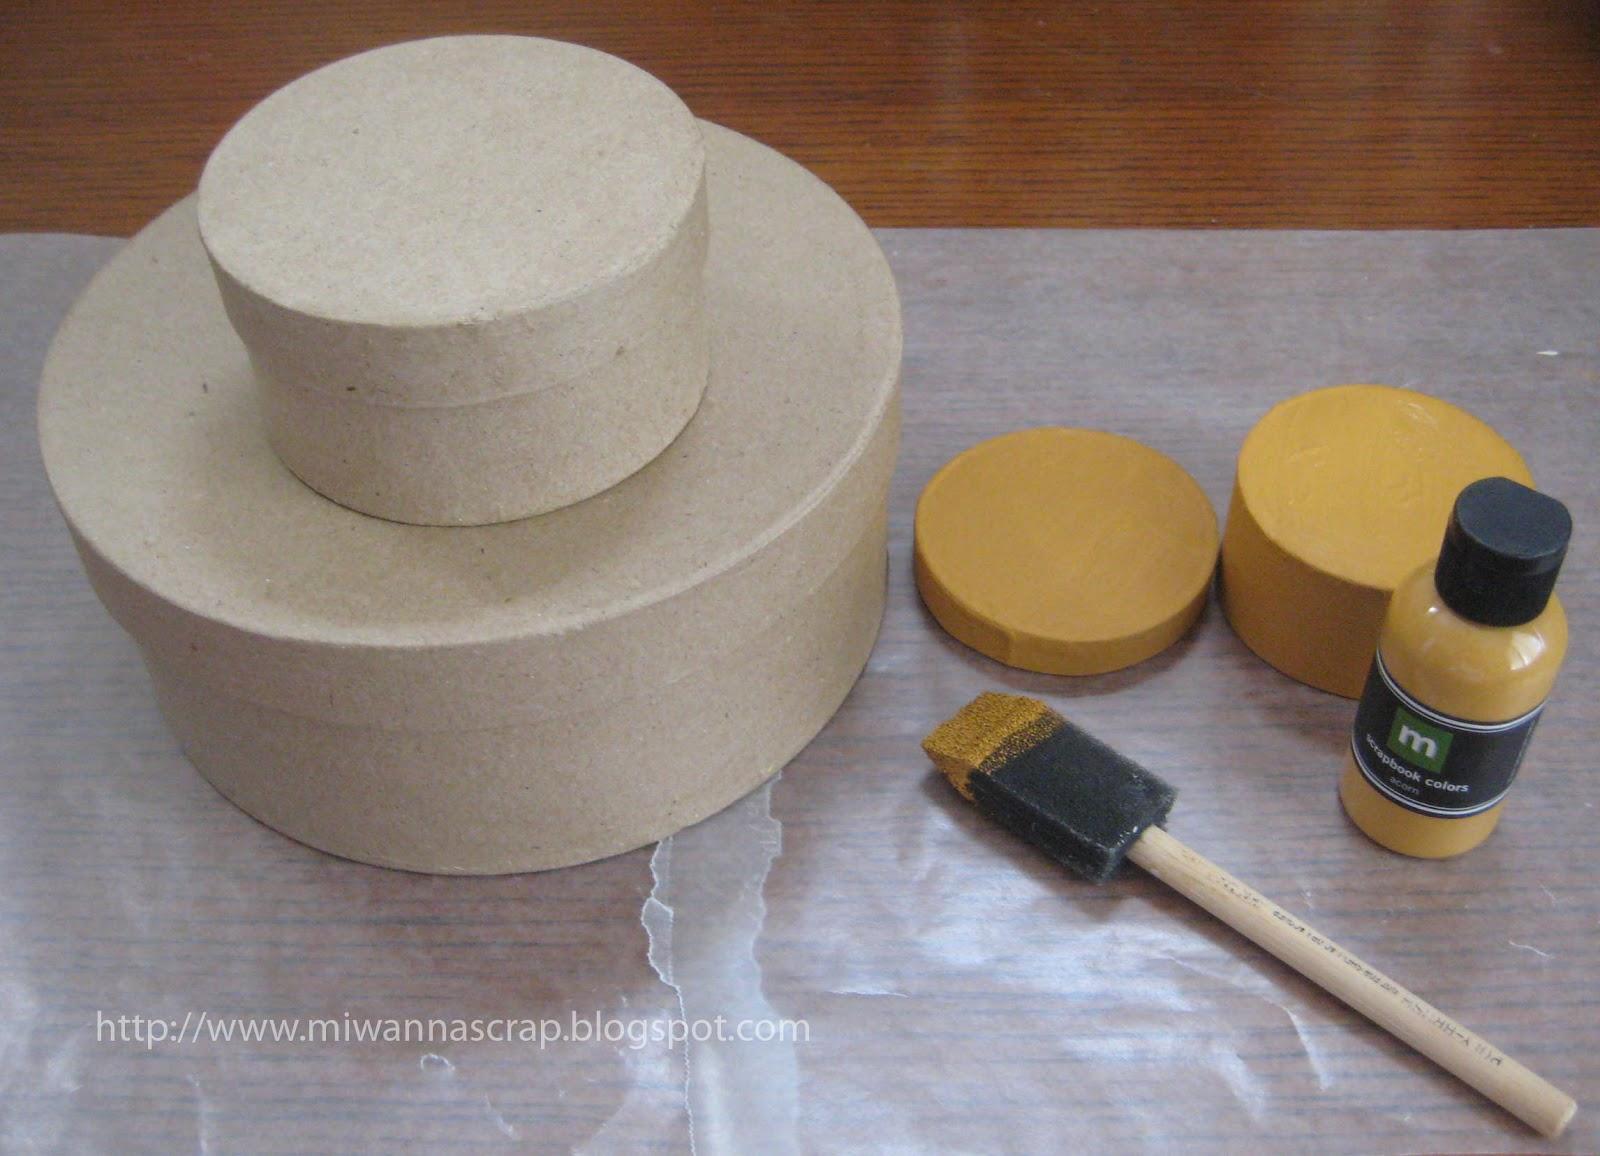 http://1.bp.blogspot.com/-RqK3LYr7Enc/UHiVZUeaoRI/AAAAAAAACFA/gW0PTe5f_bc/s1600/Step+1+-+Painting+the+Paper+Mache+Boxes.JPG